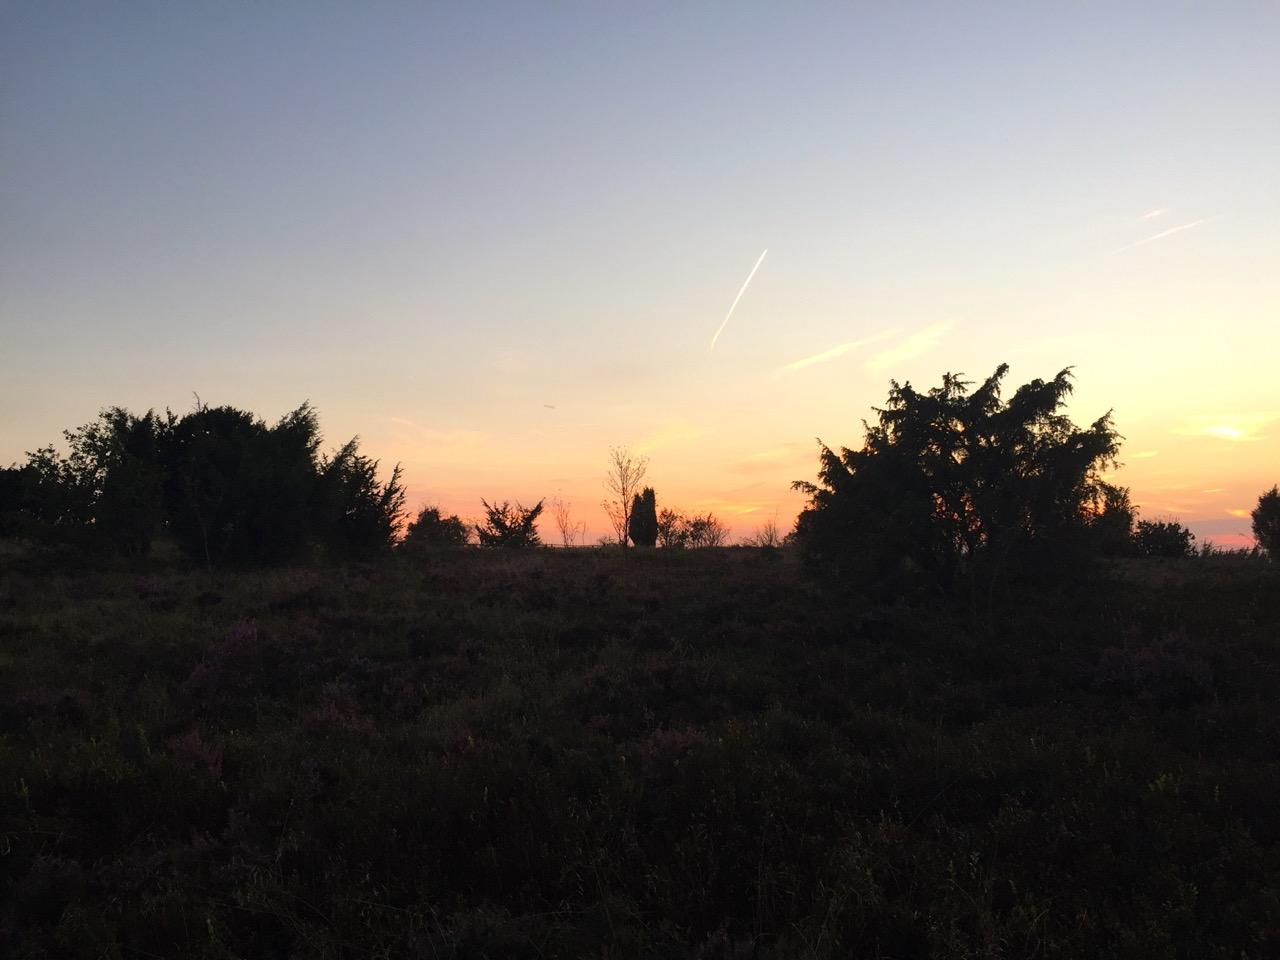 Lüneburger Heide: Wandern auf dem E1